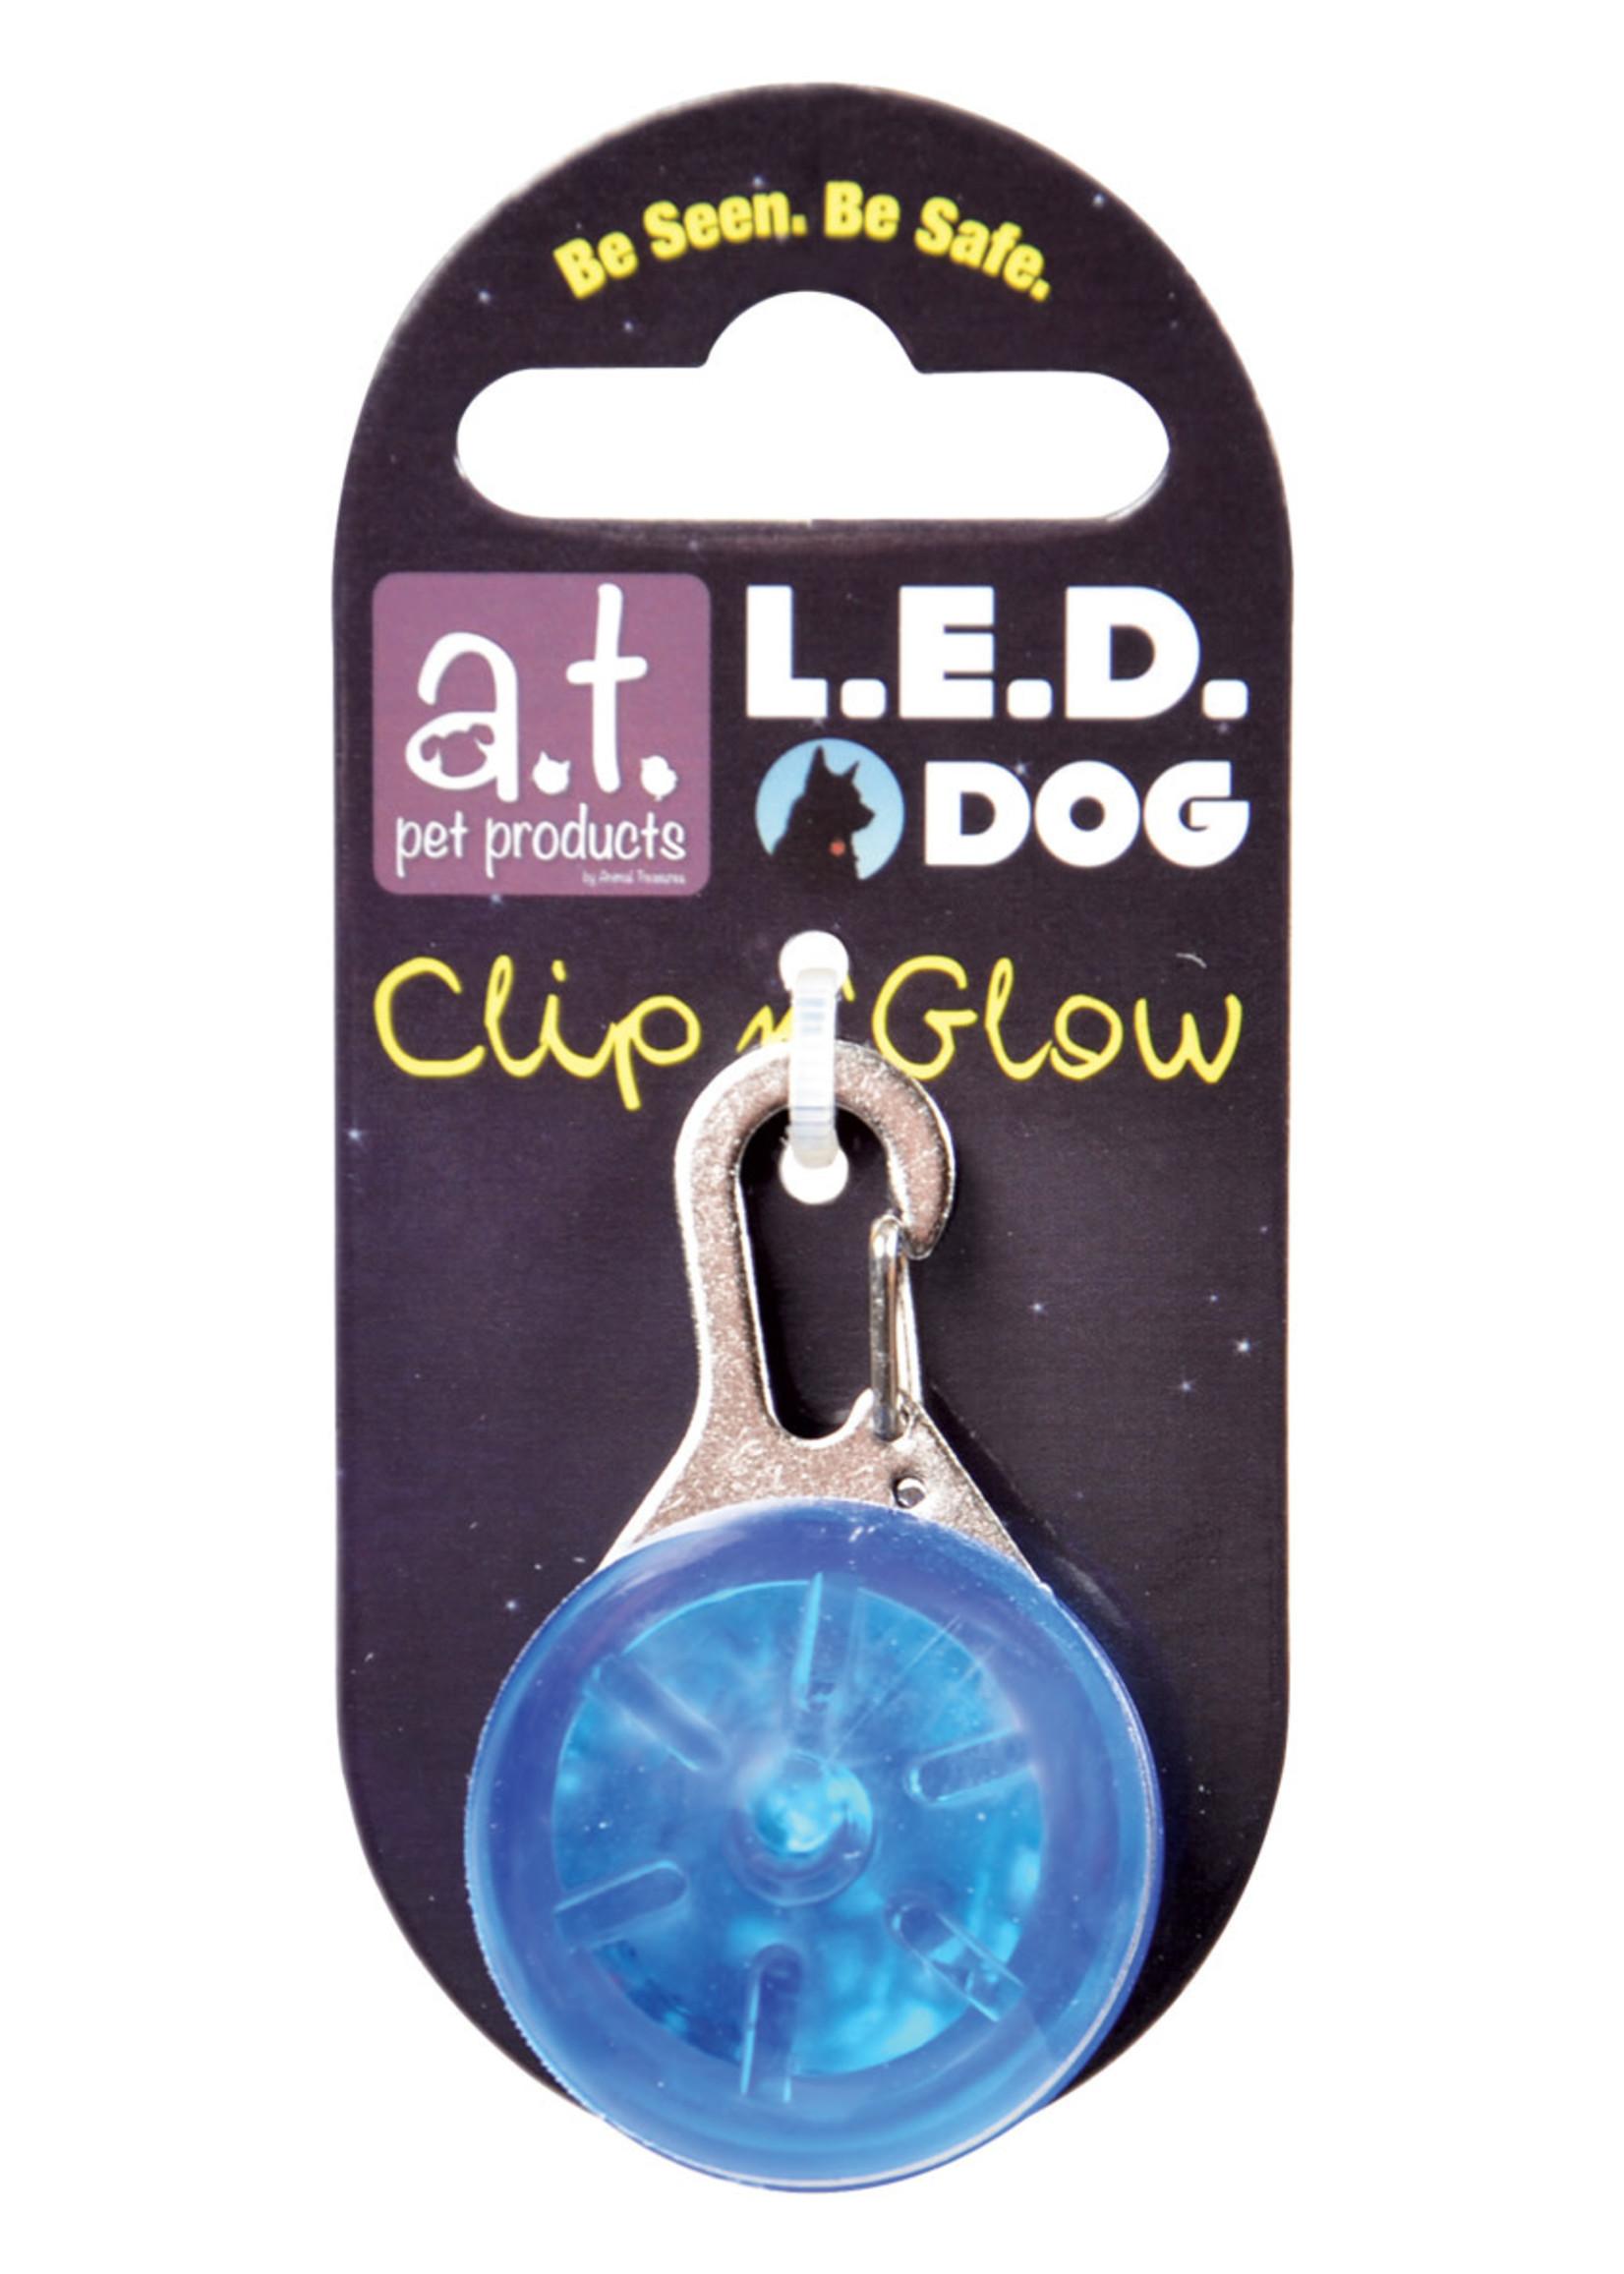 Animal Treasures Animal Treasures LED Clip n' Glow Tag - Blue